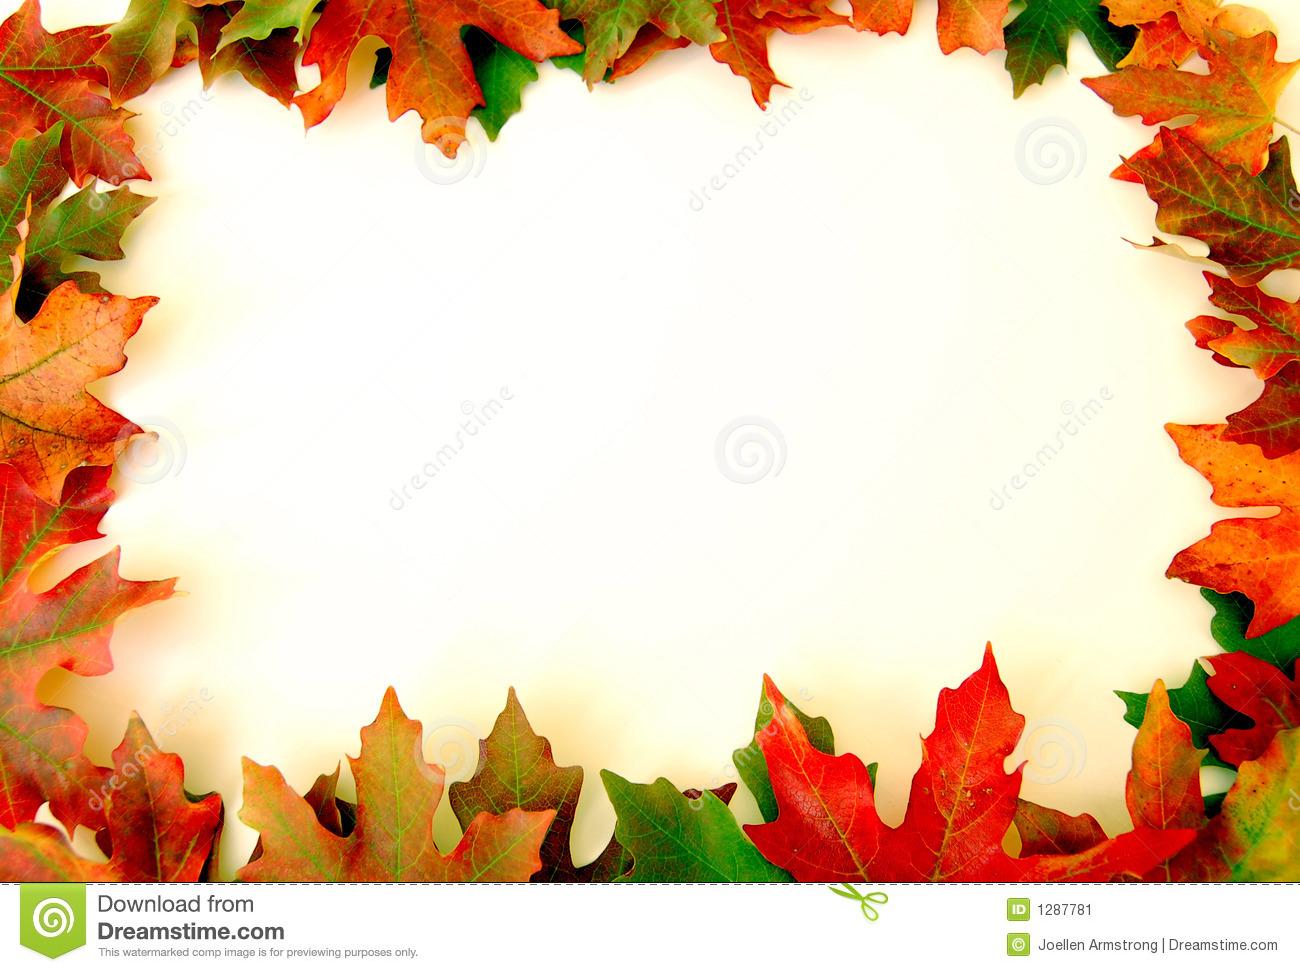 Autumn leaves on white background on border of photo 1300x972